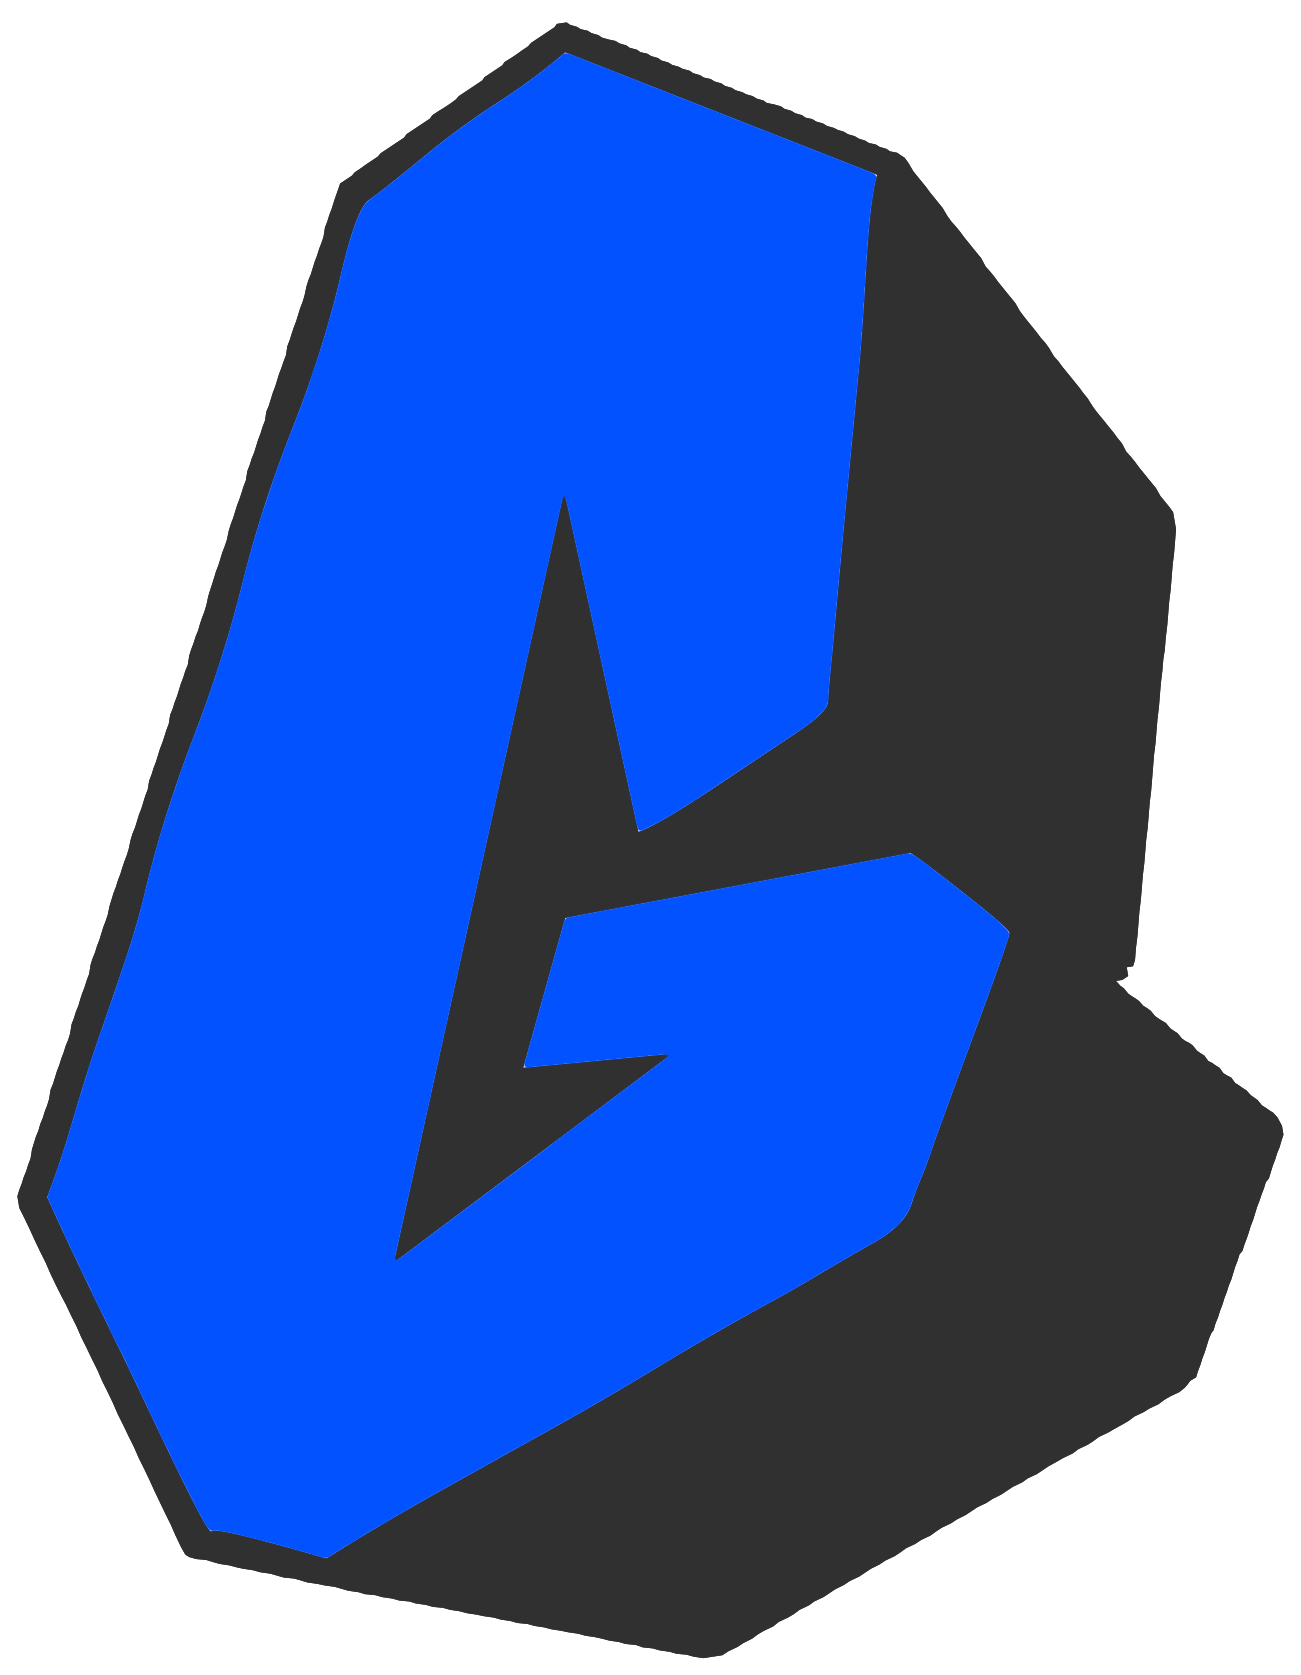 G (light lead:blue).png